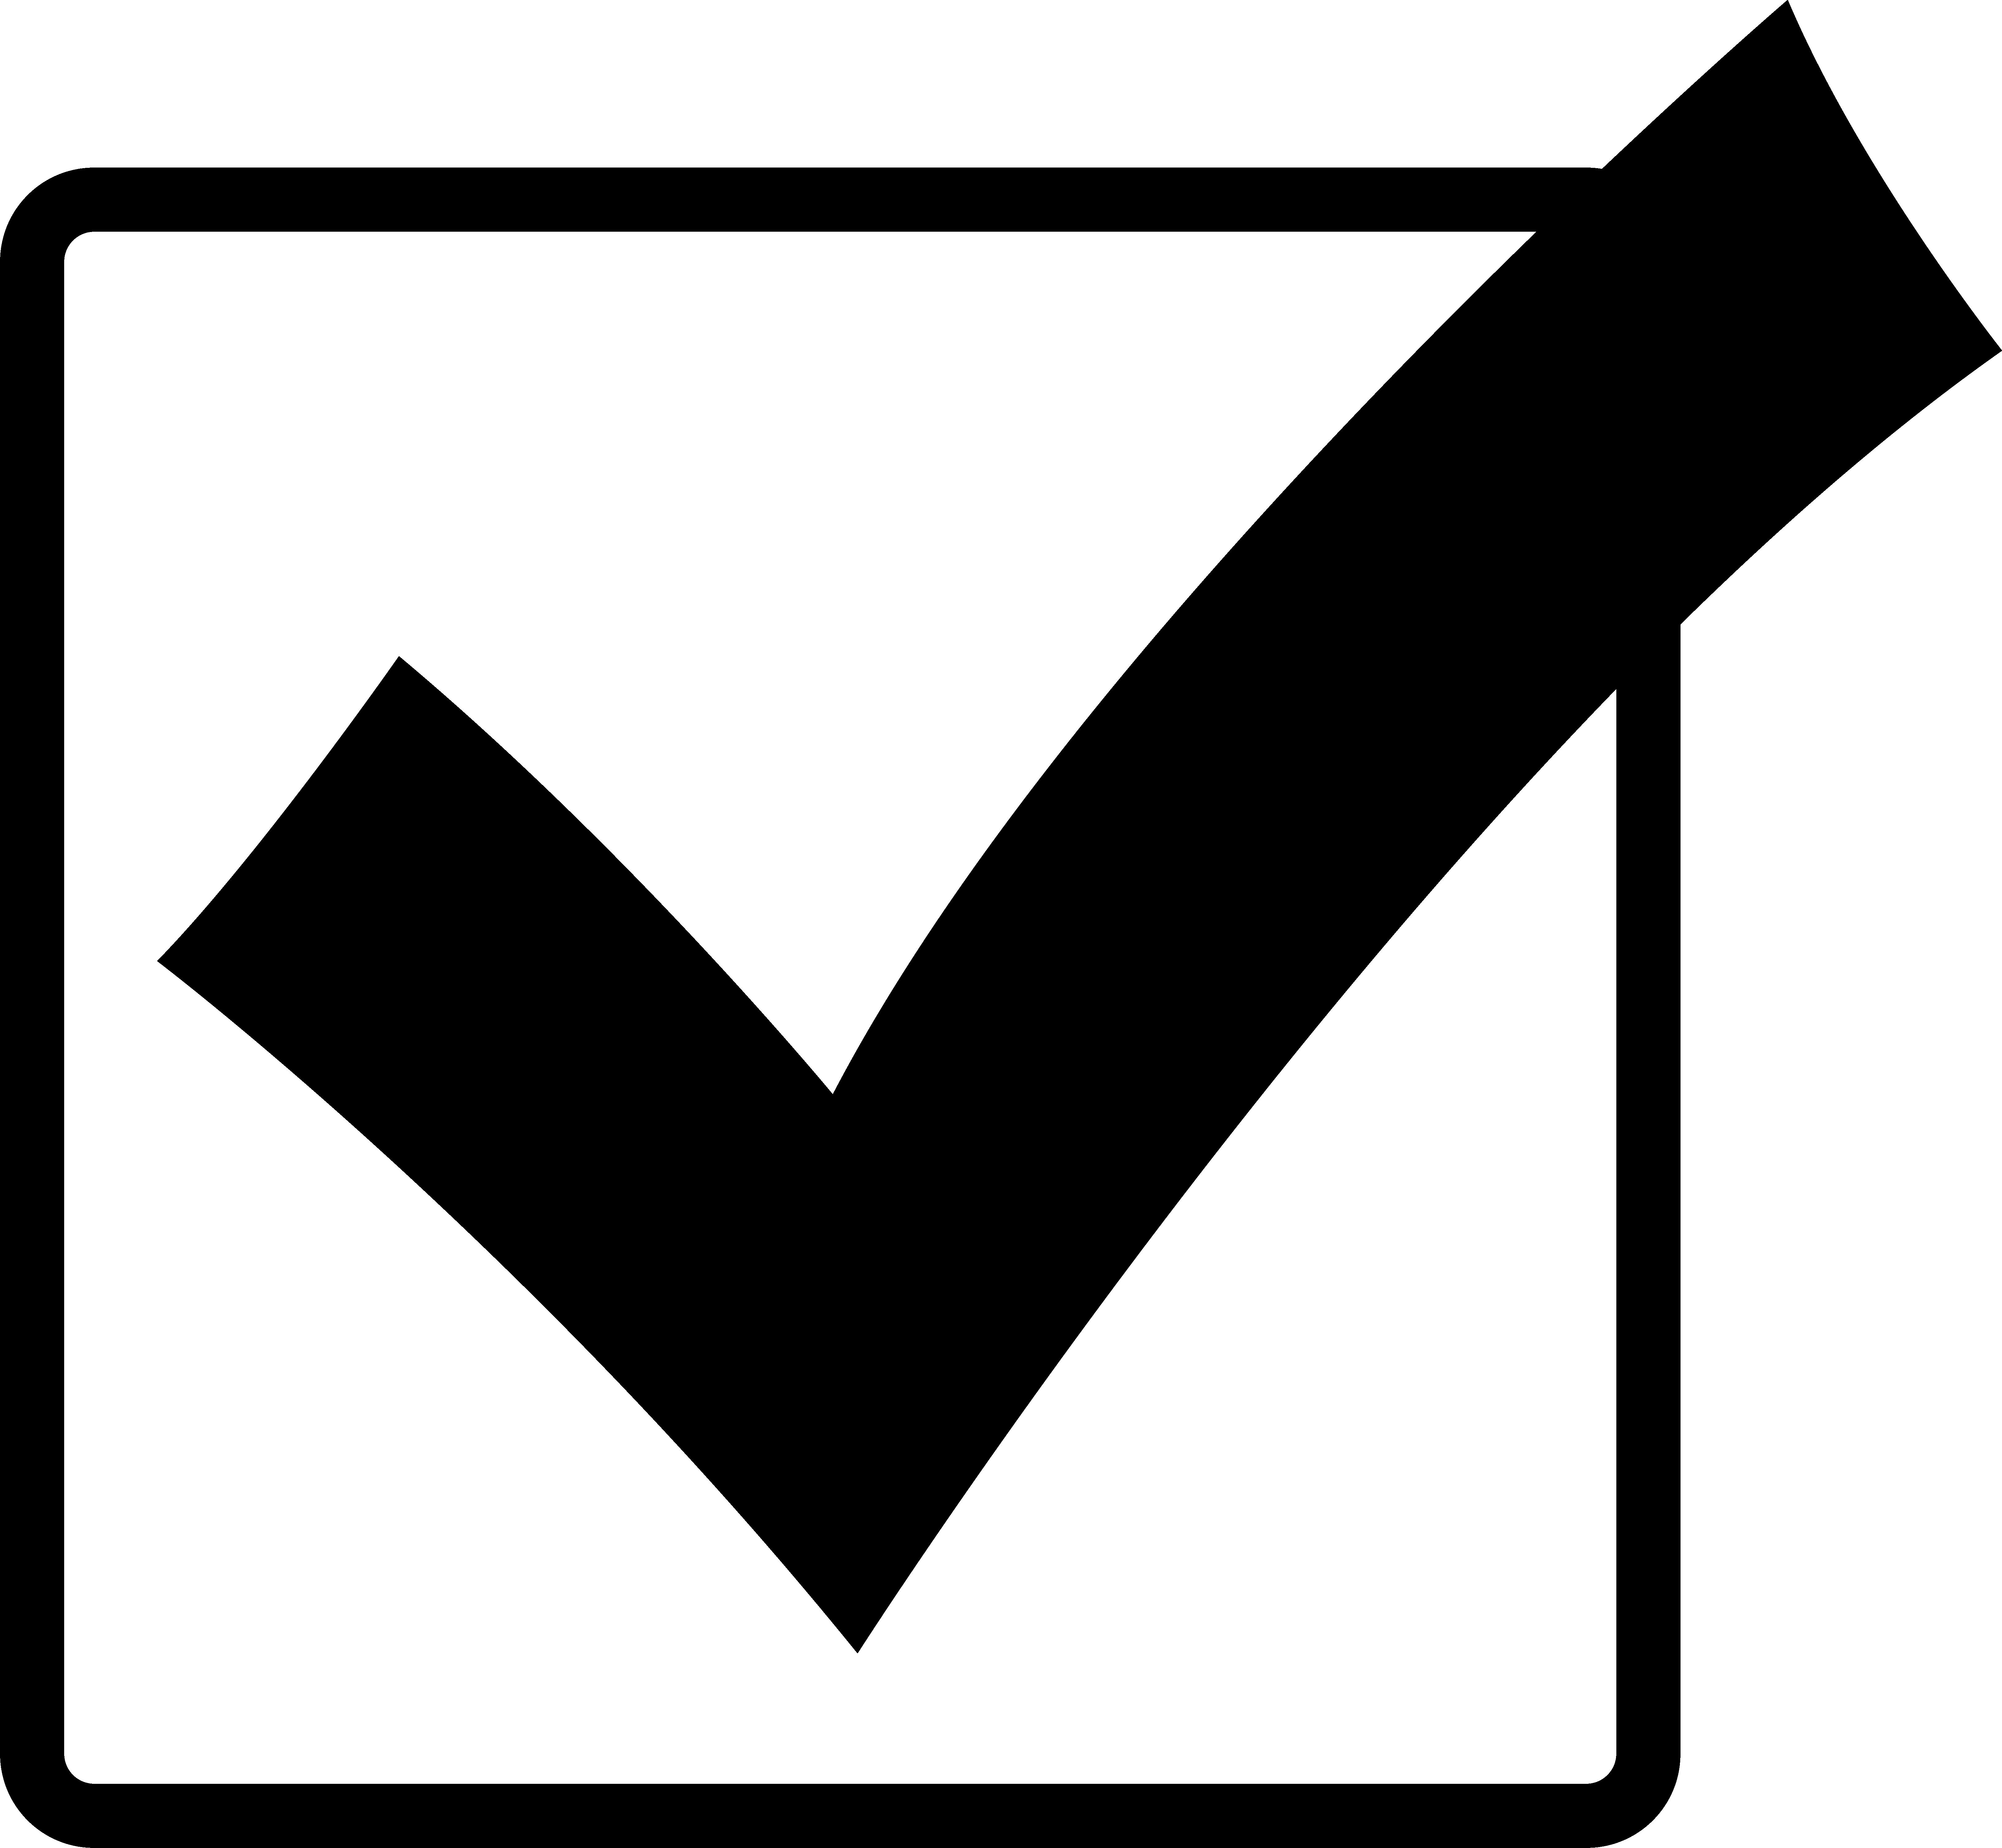 Blank Check Clip Art - ClipArt Best